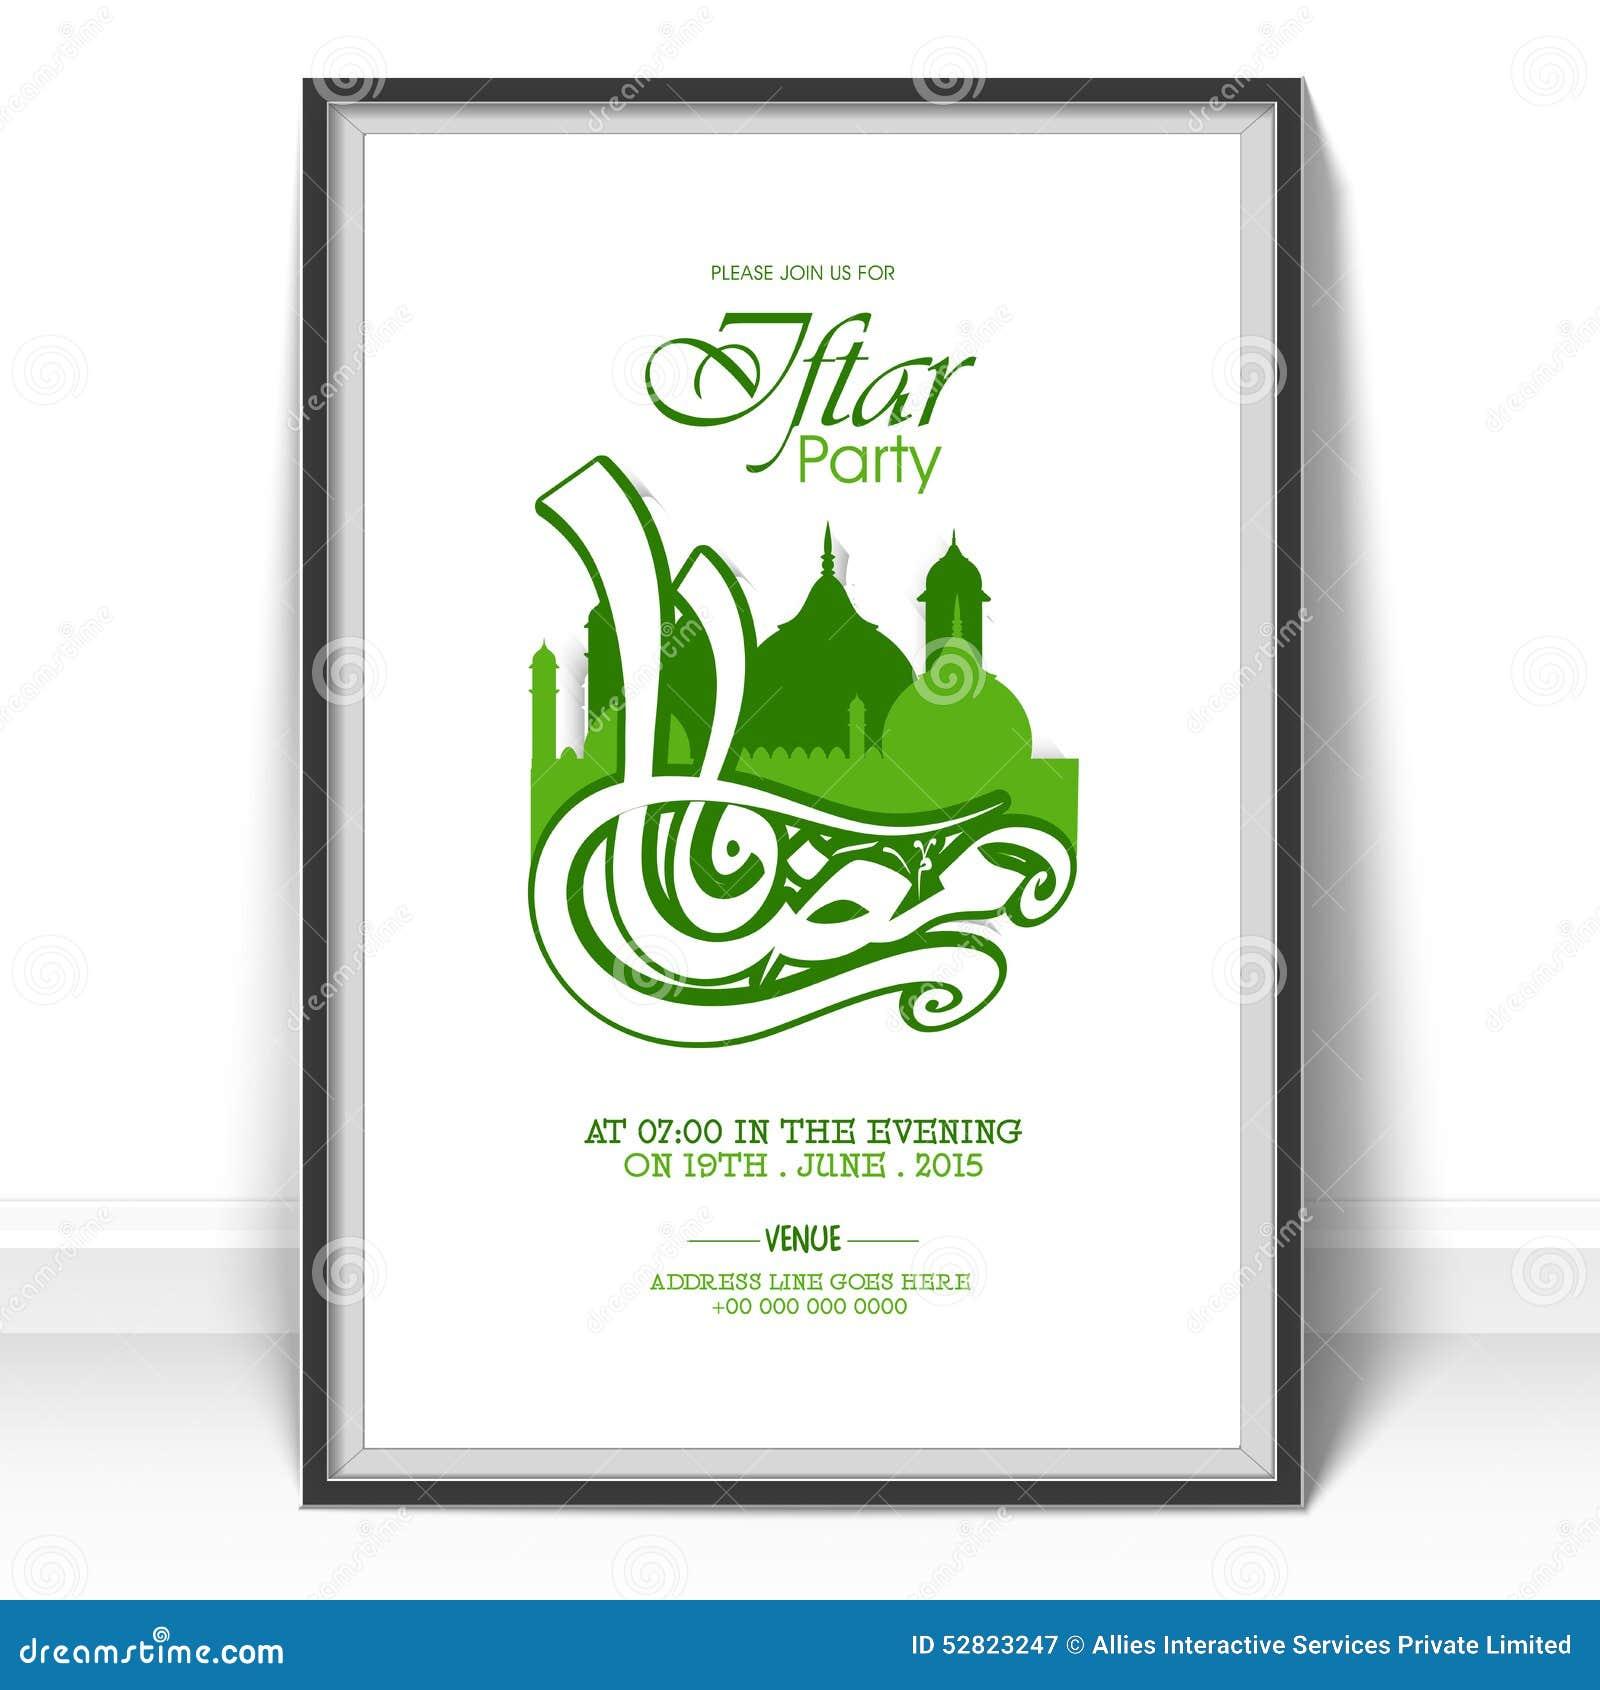 Arabic Invitation Cards for amazing invitations sample